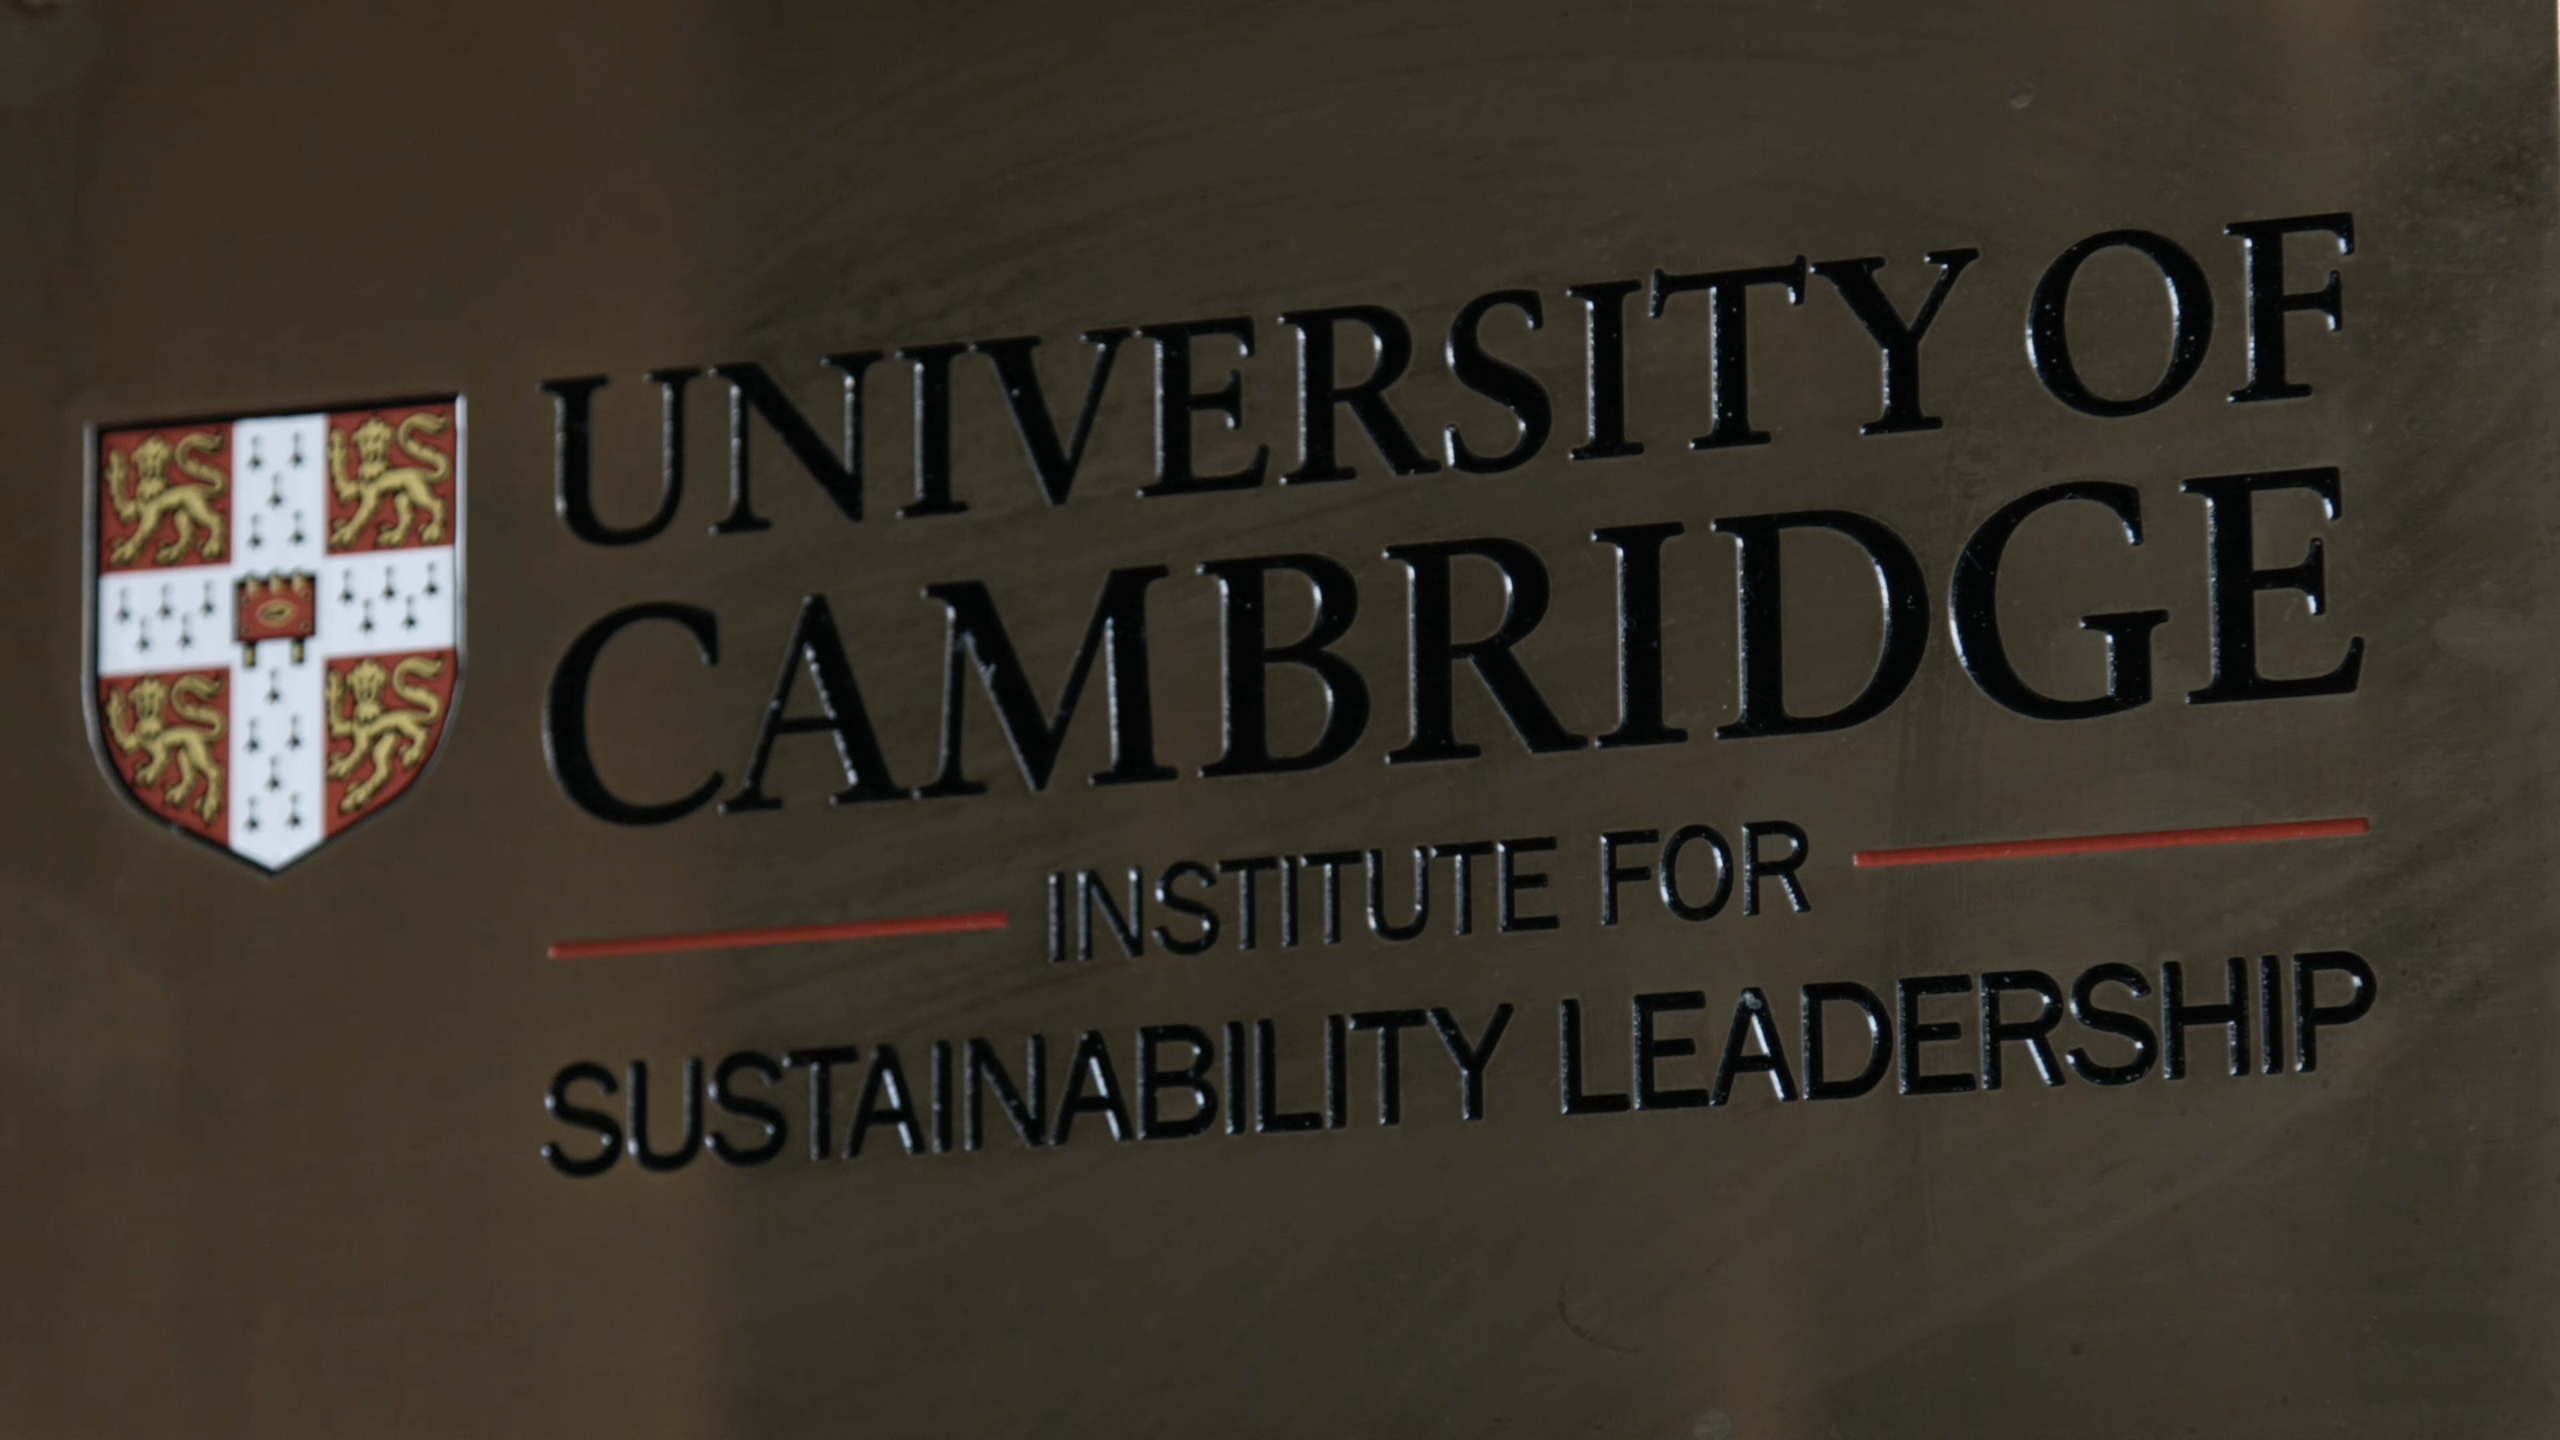 University of Cambridge CISL